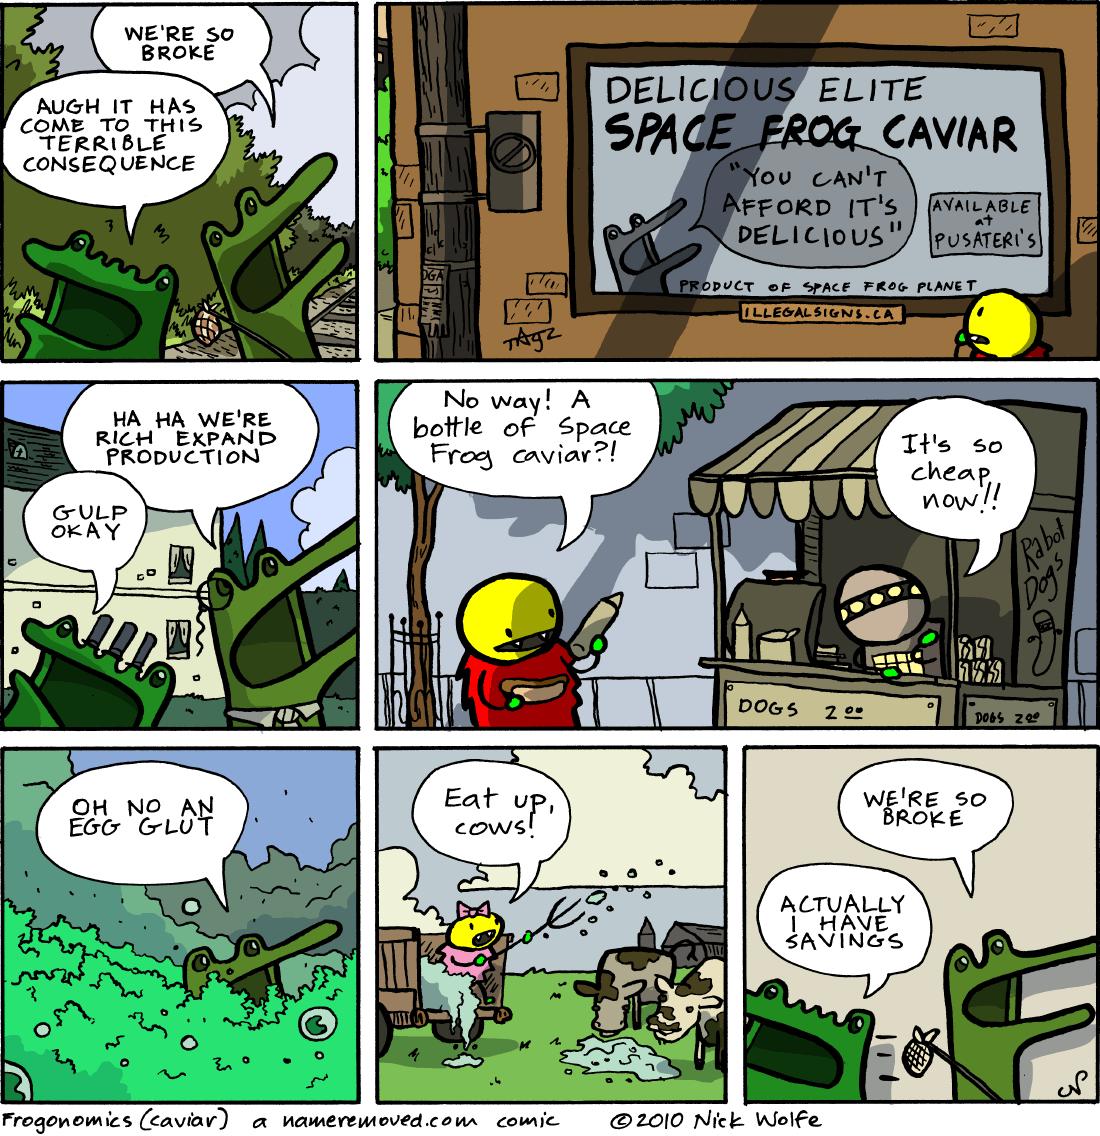 Frogonomics (caviar)